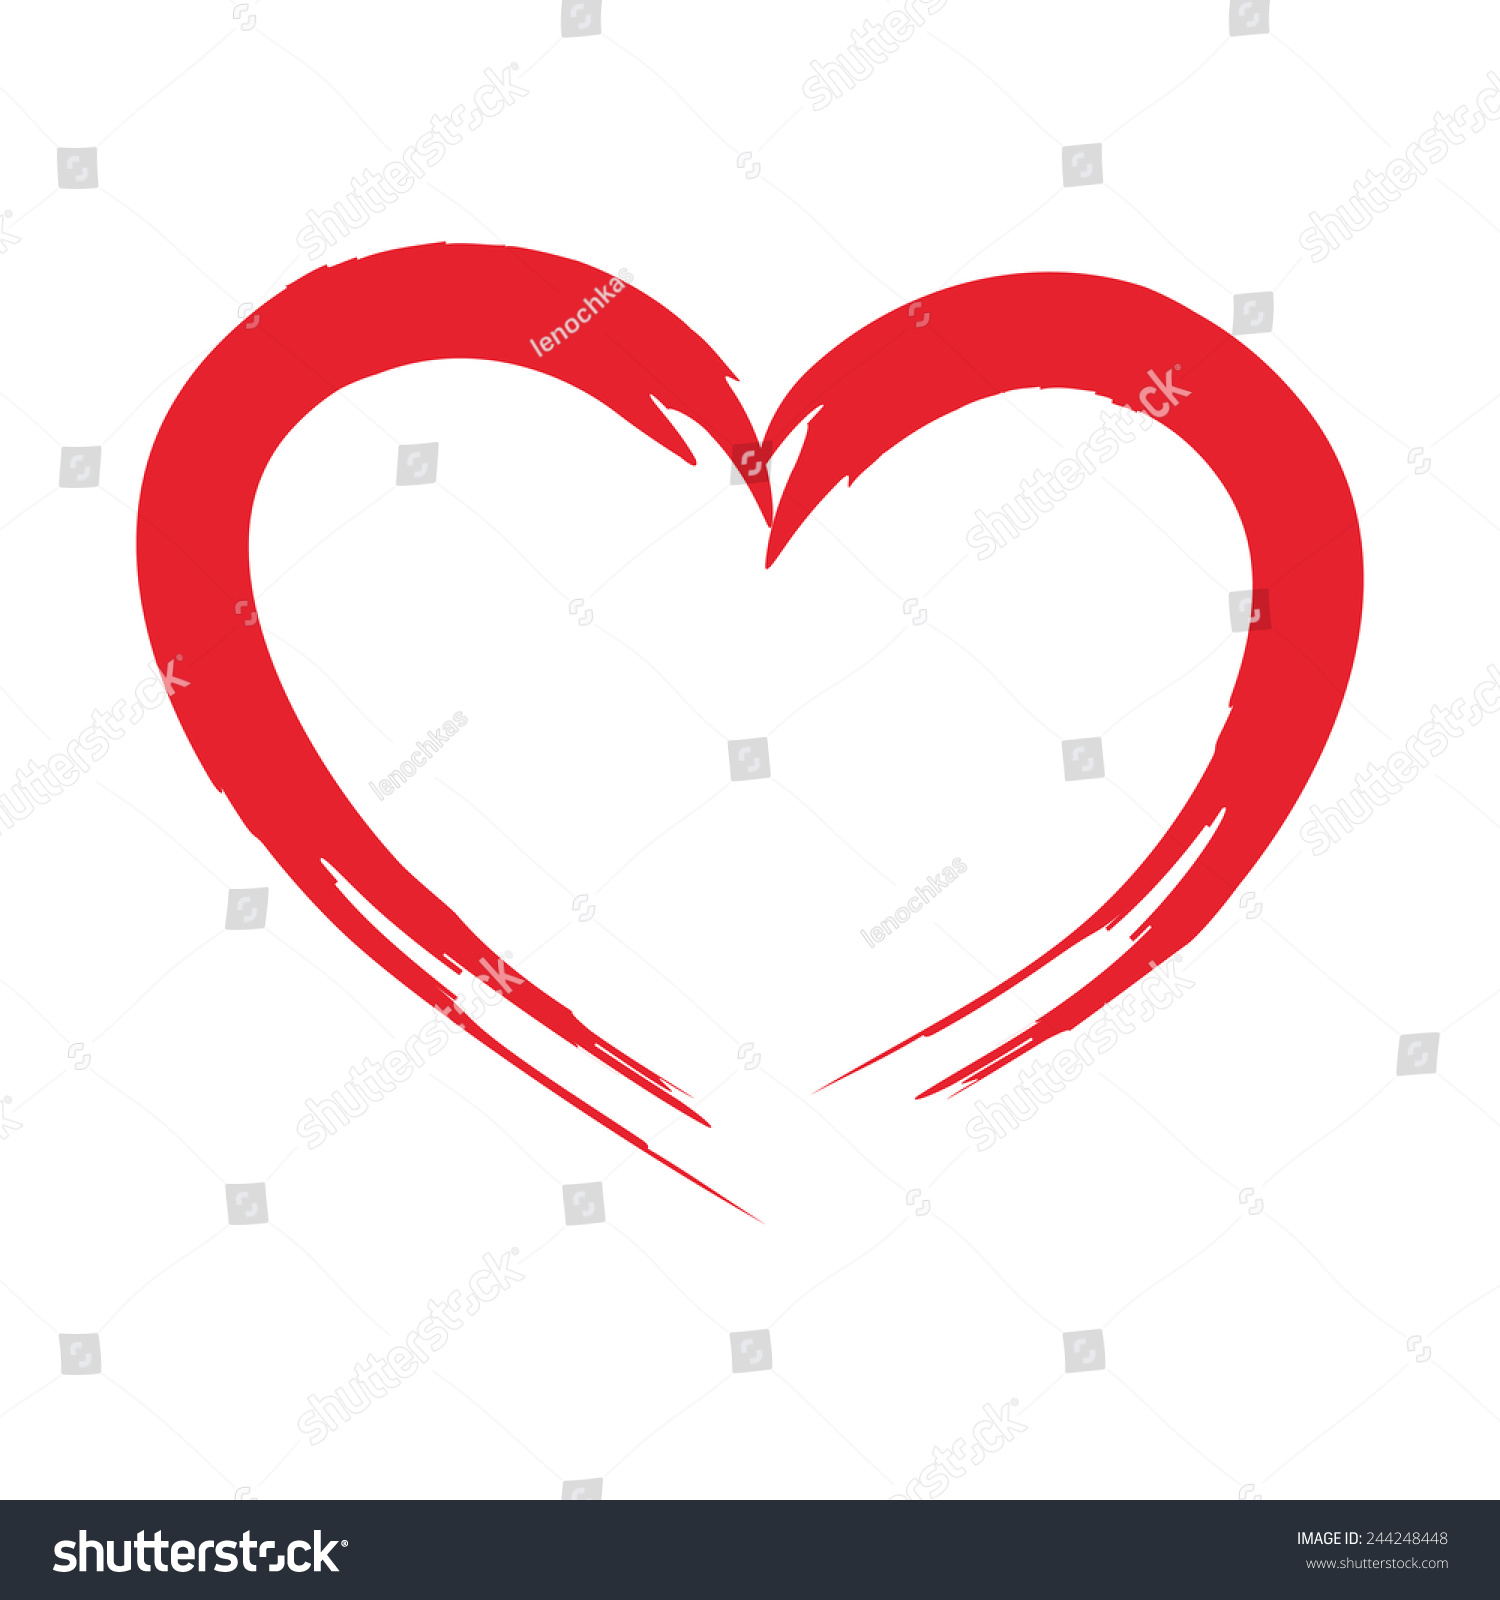 Drawing Brush Shape Heart Love Symbol Stock Illustration 244248448